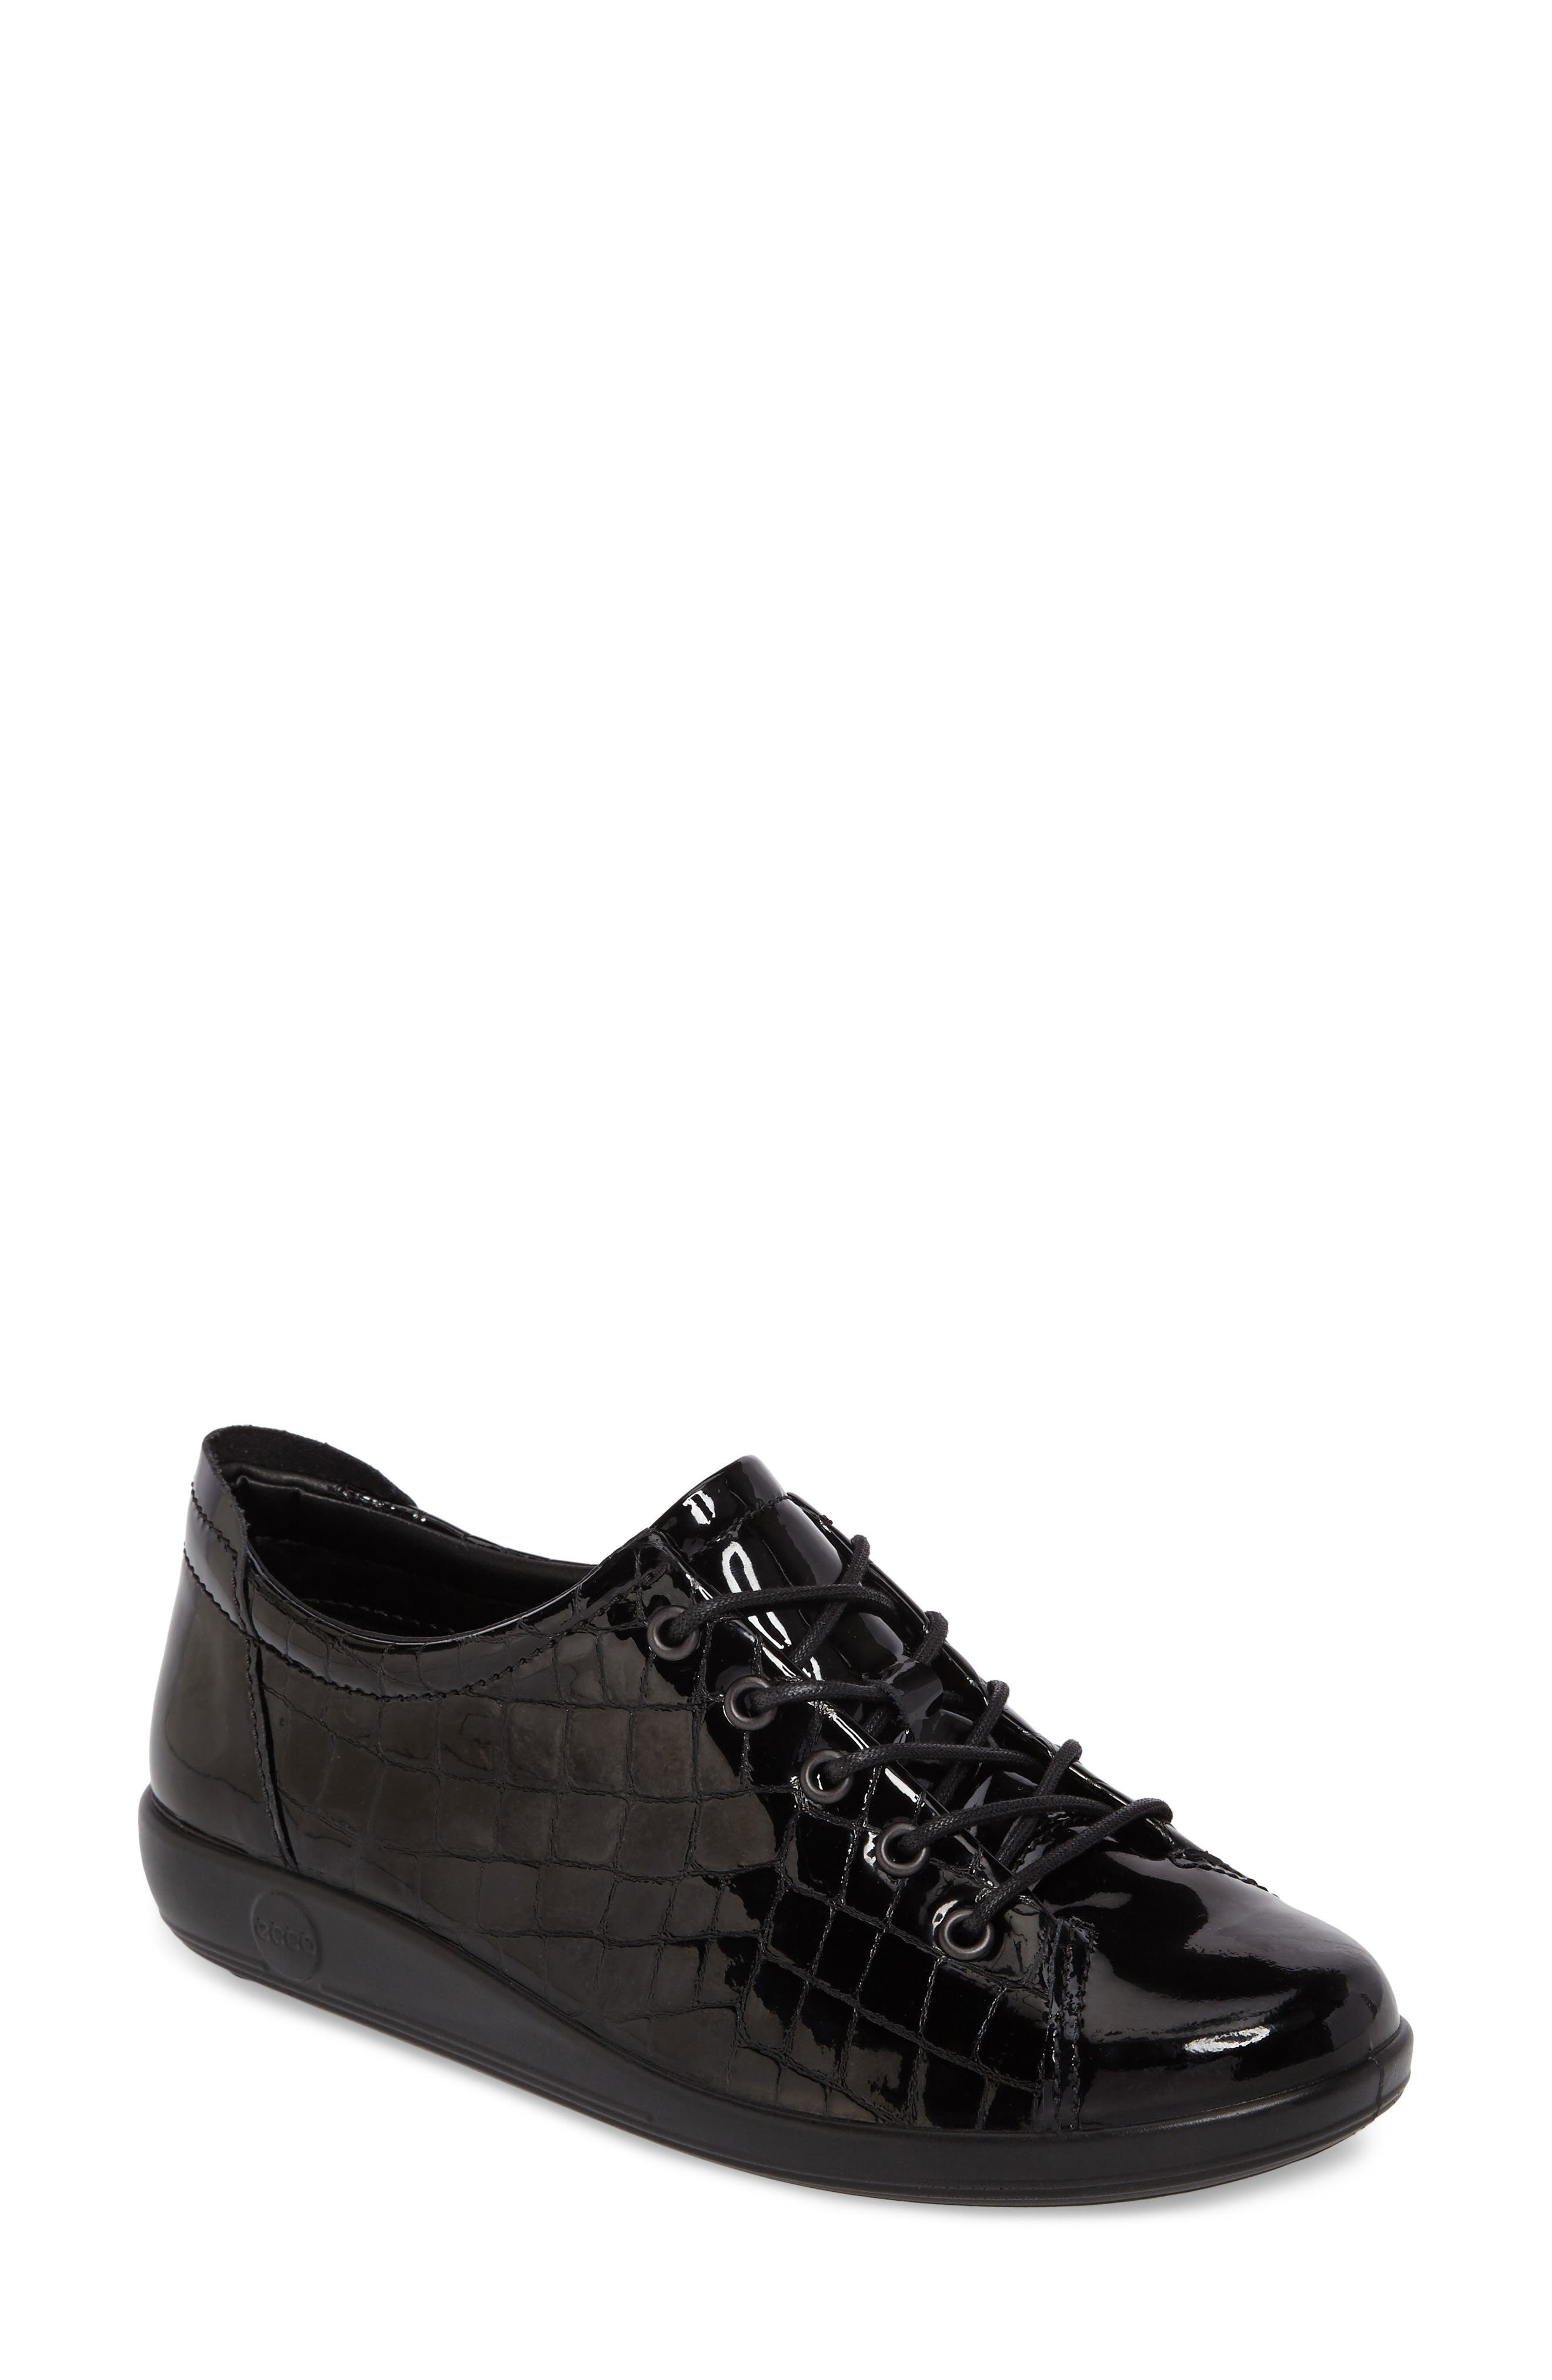 Main Image - ECCO 'Soft 2.0' Sneaker (Women)